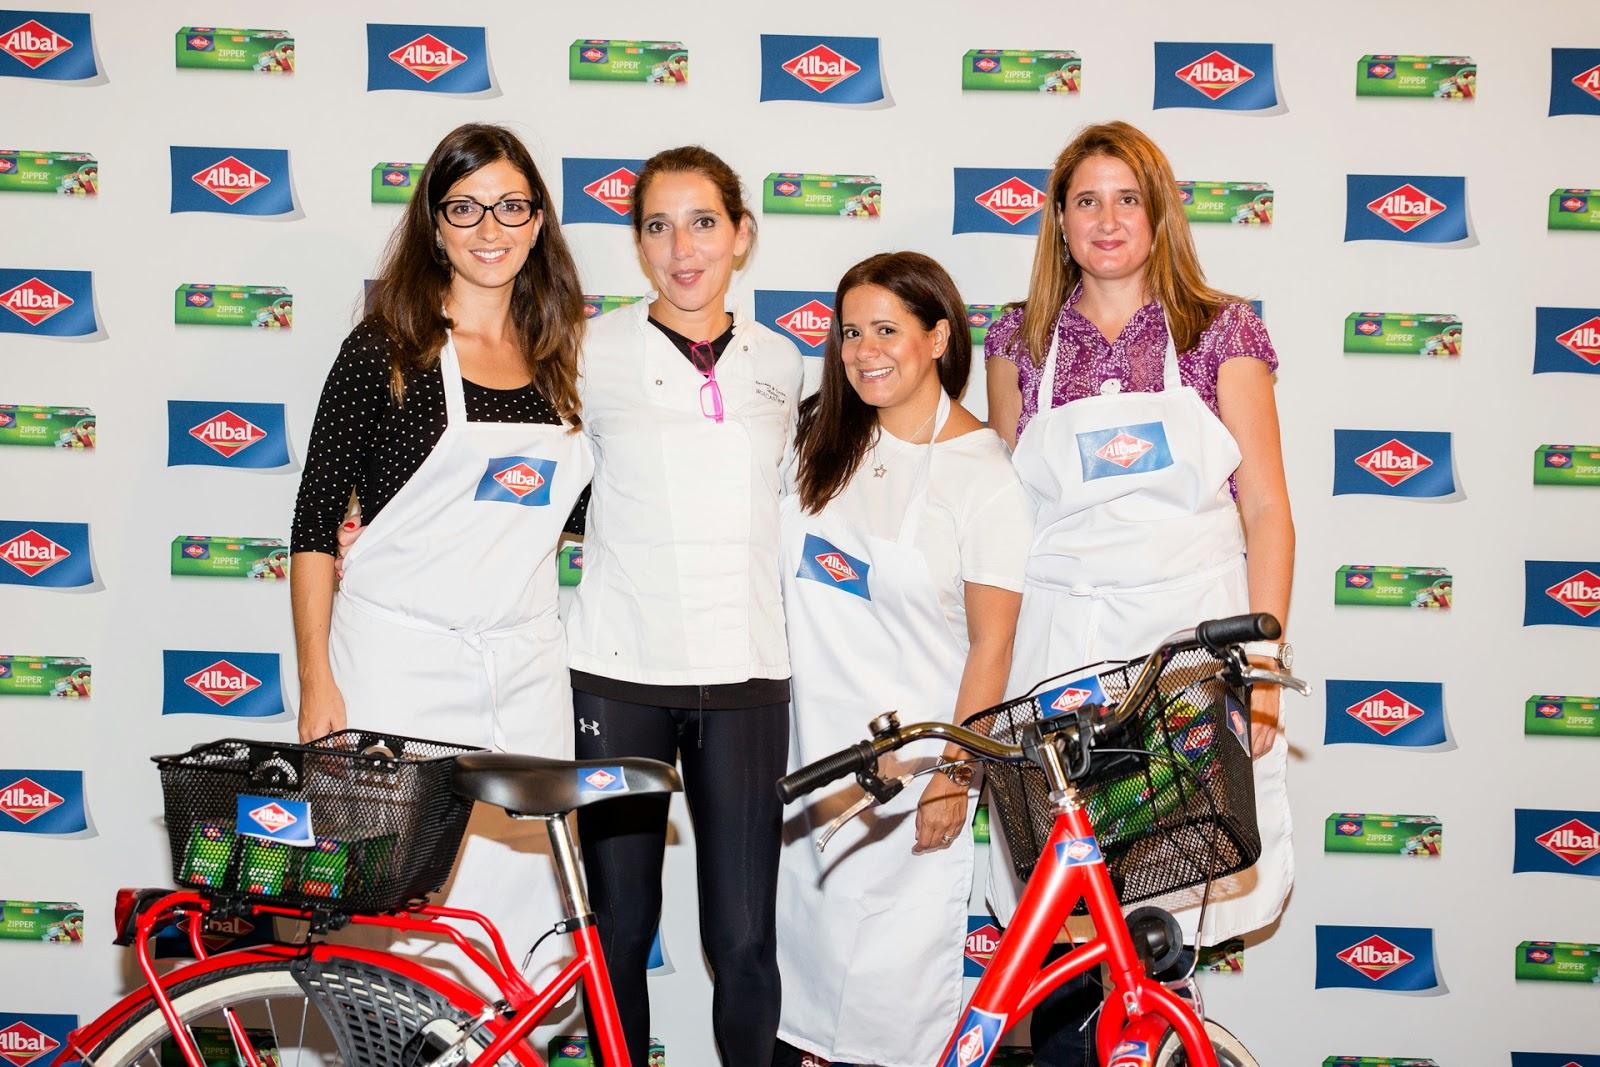 Taller de Cocina con Iria Castro y Albal